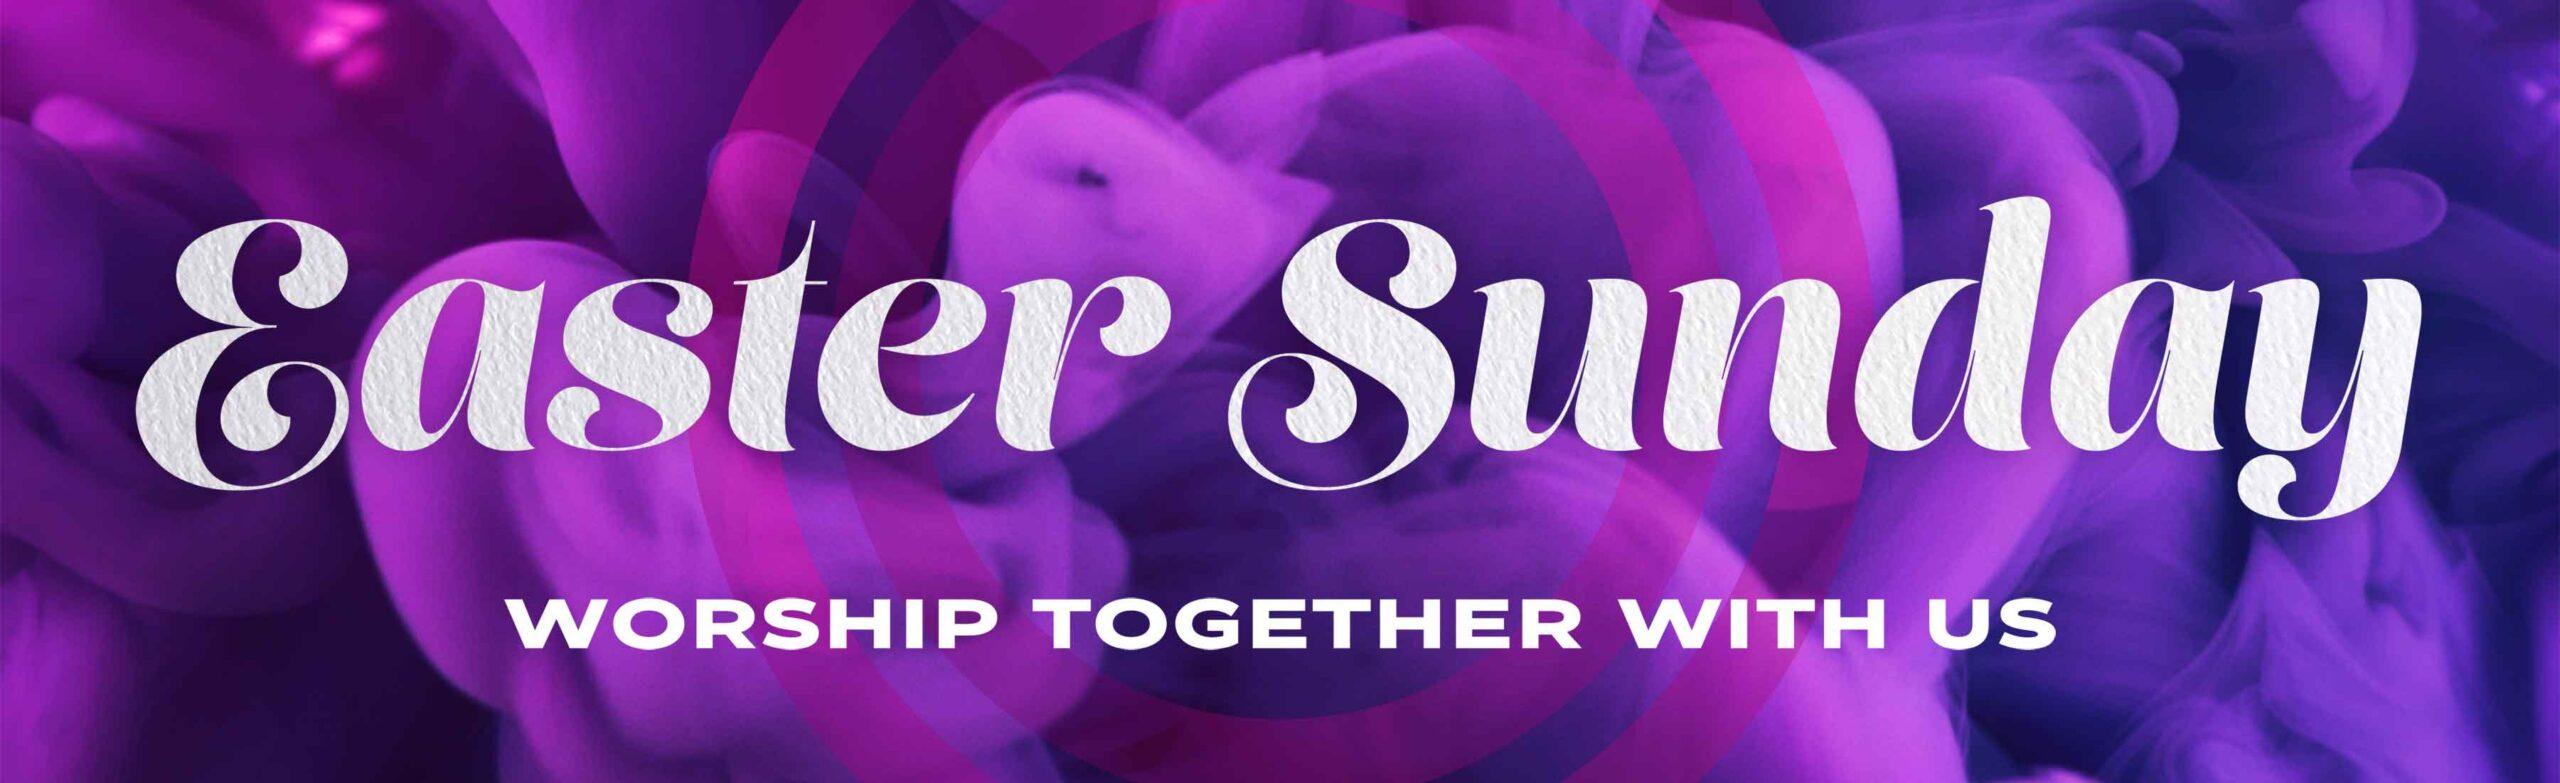 Easter-Sunday-Low-Res-Slider